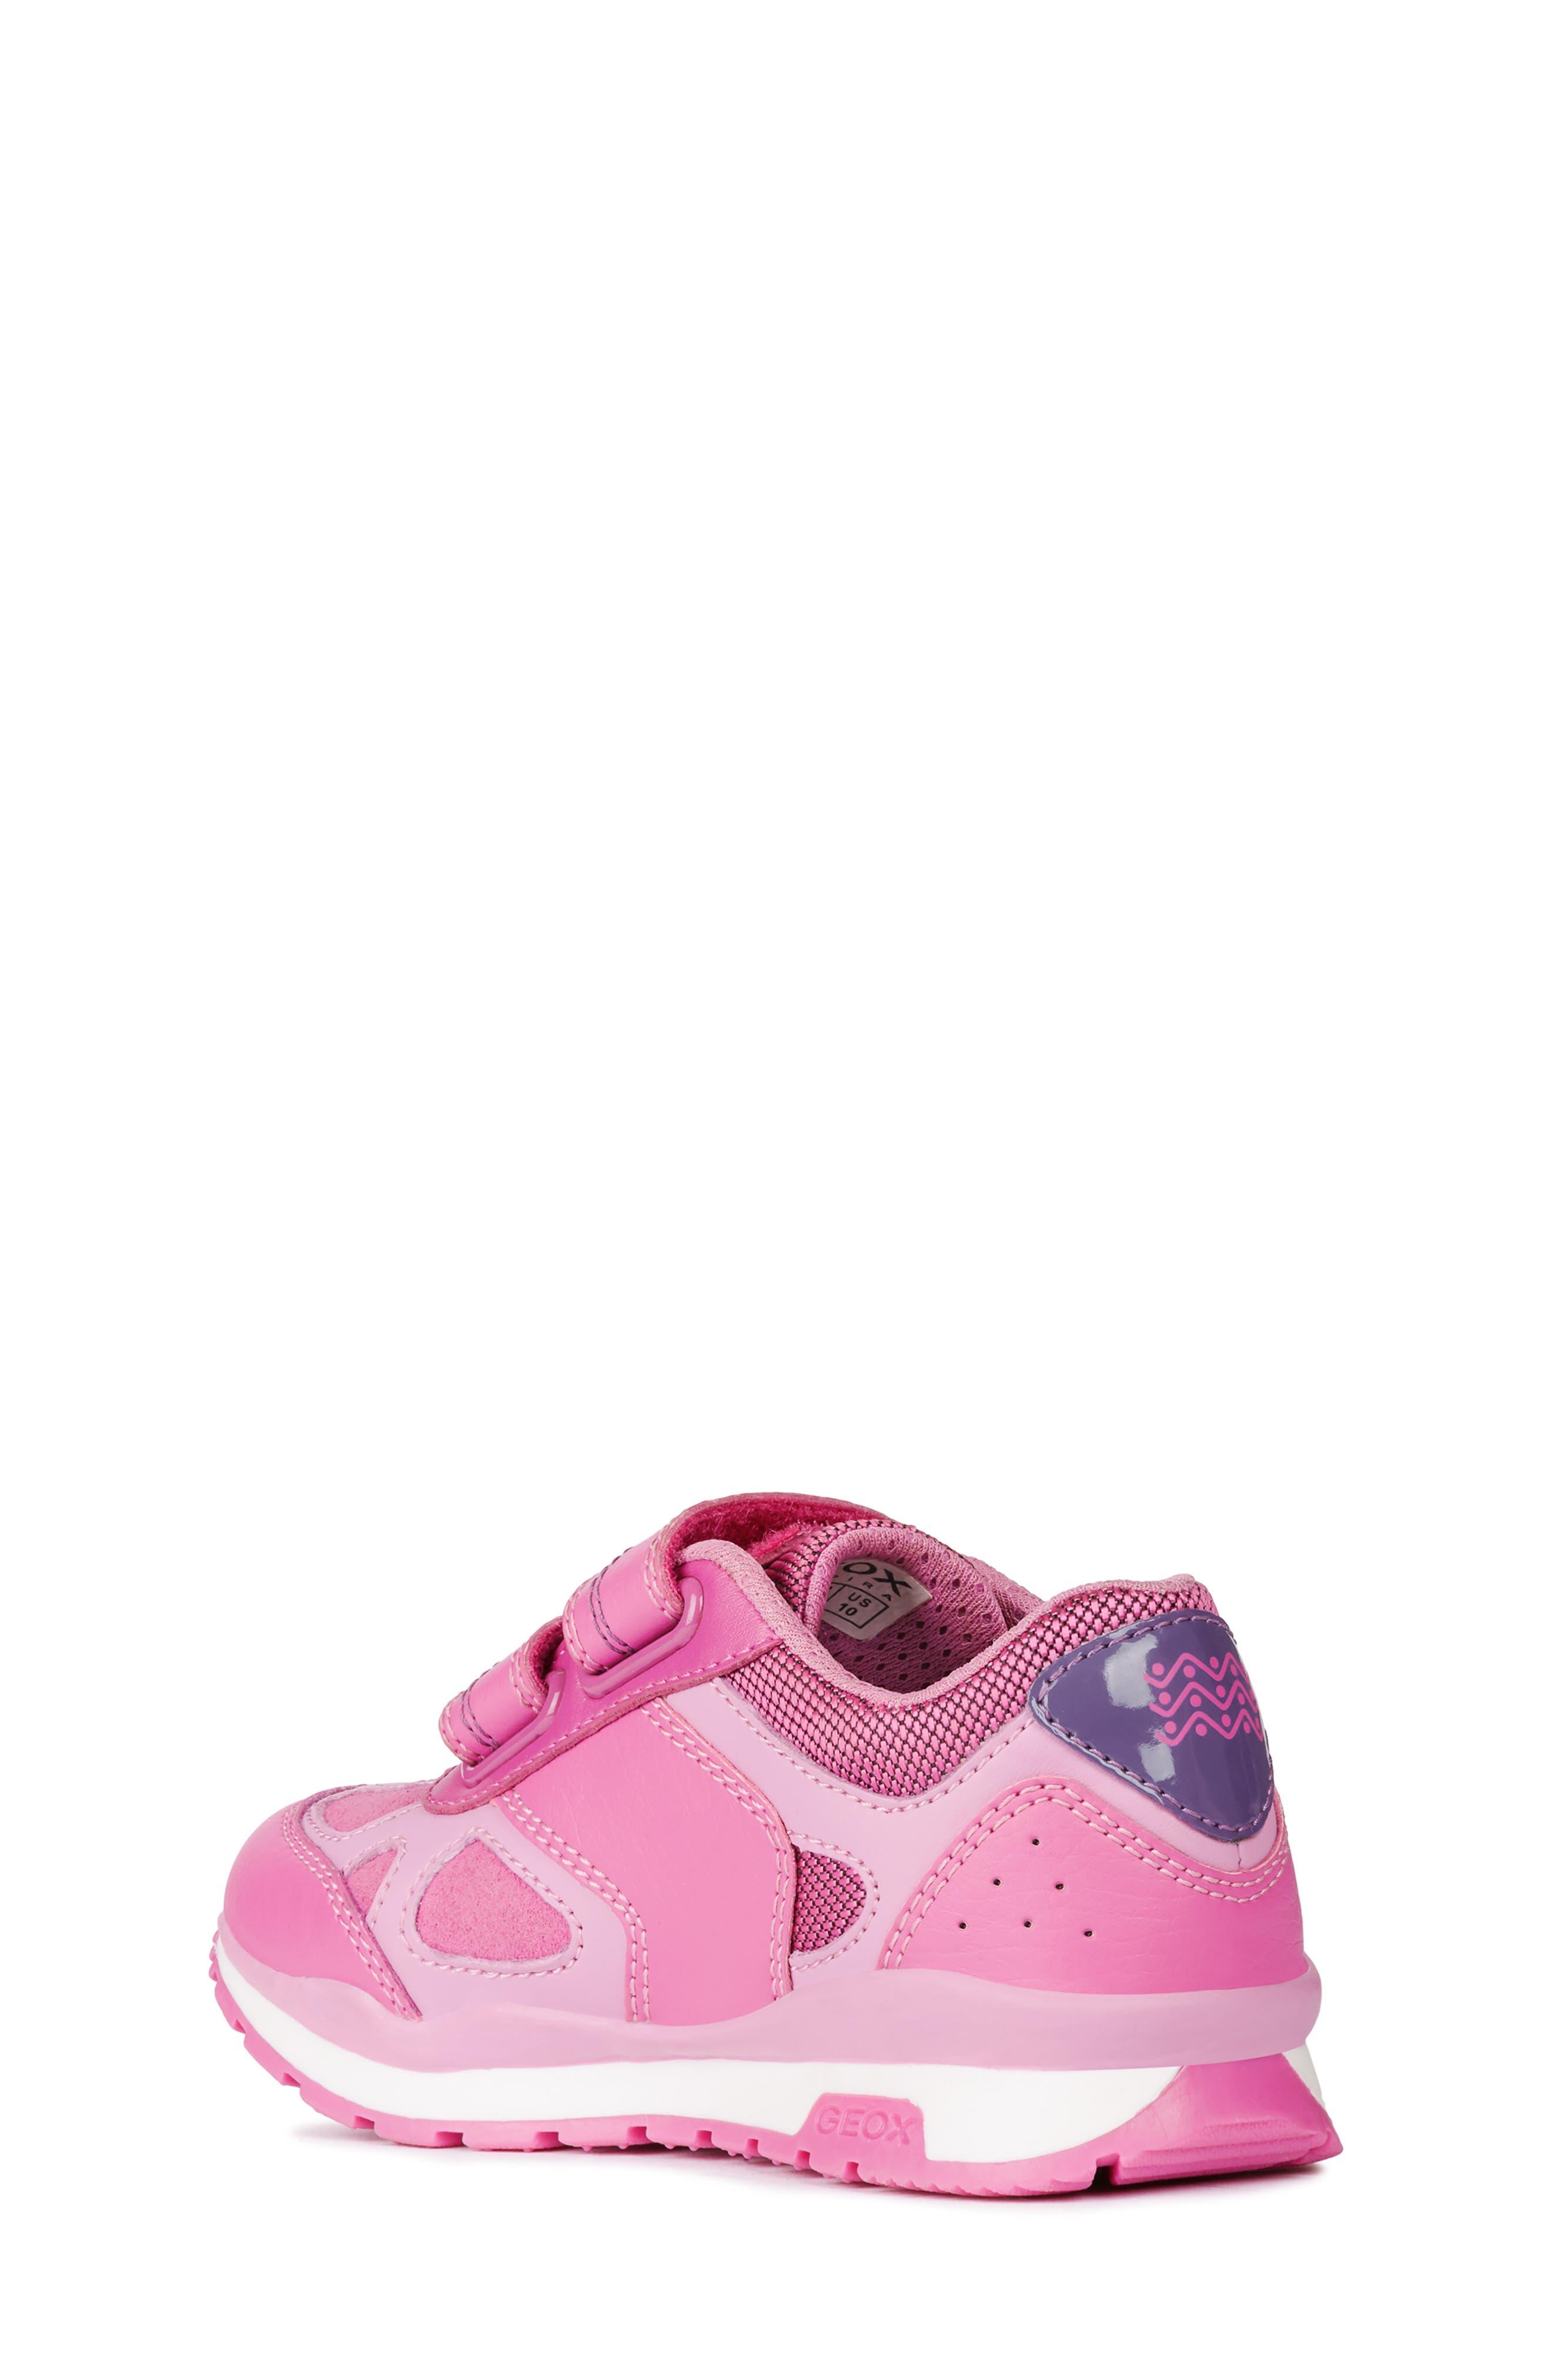 Pavel Sneaker,                             Alternate thumbnail 2, color,                             FUCHSIA/PINK